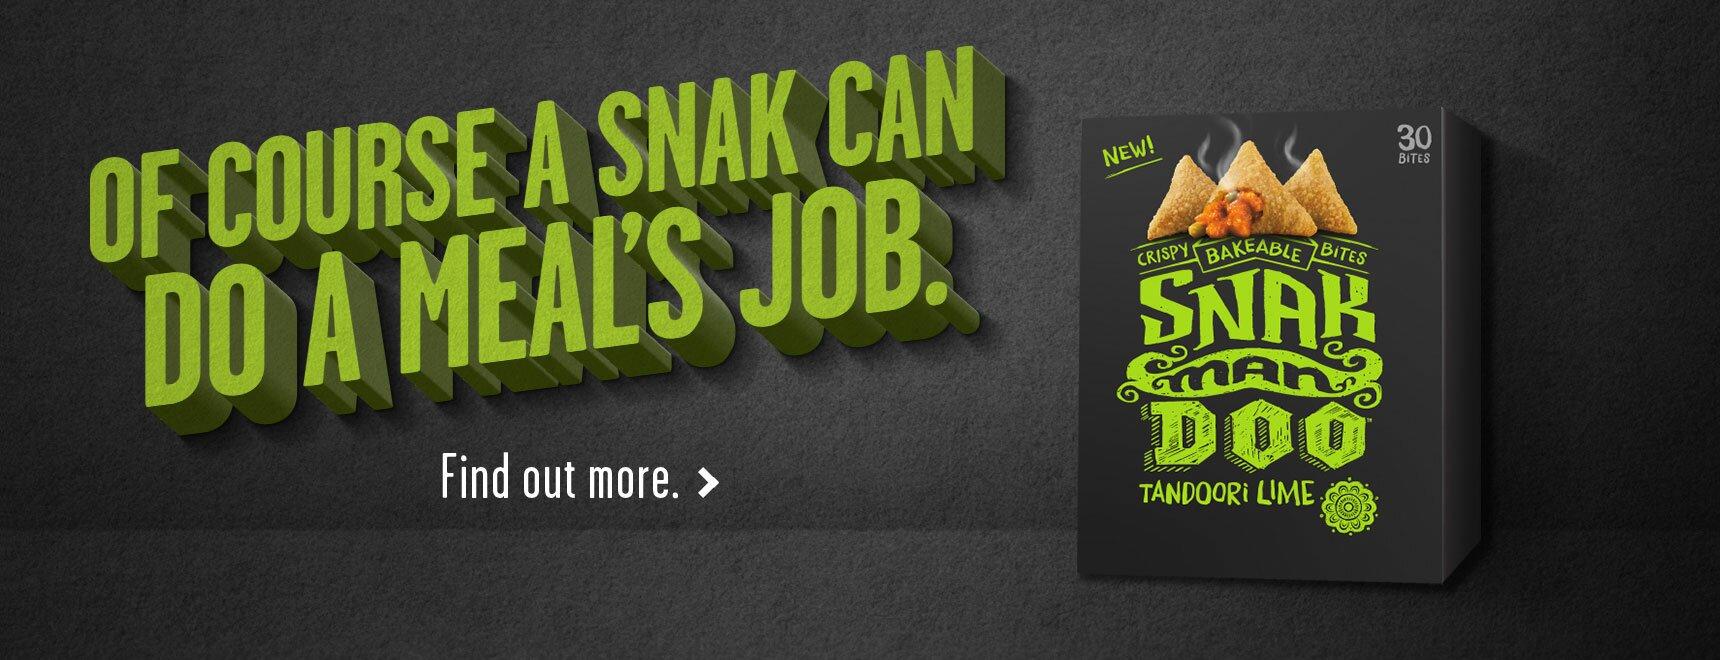 Tandoori Lime Bites from Snakmandoo. a Bellisio Foods brand